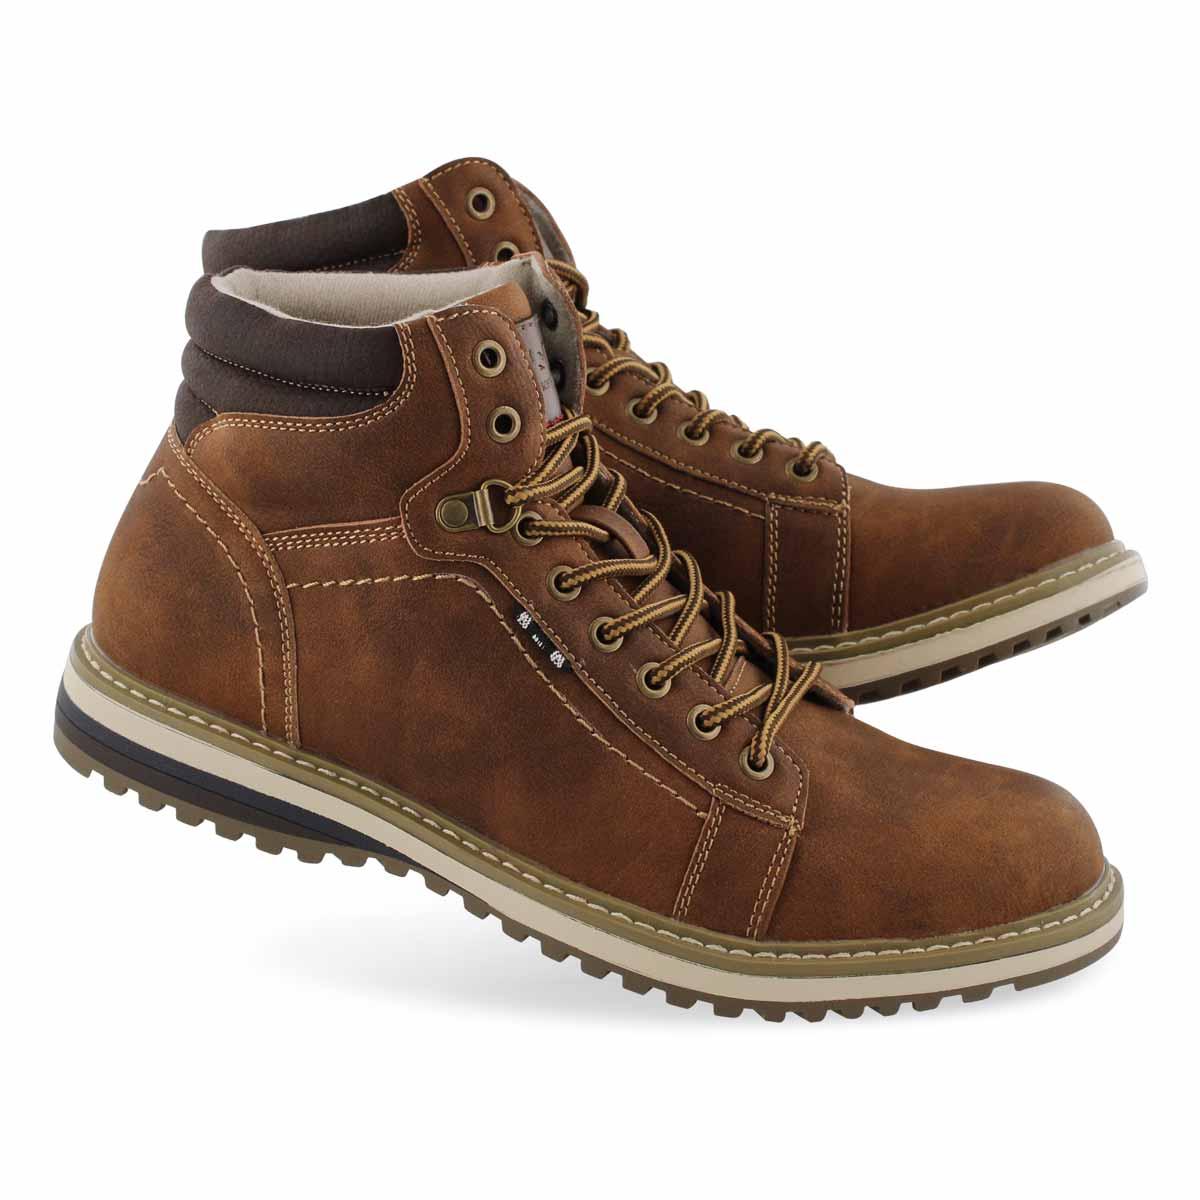 Mns Bulldozer cognac lace up ankle boot